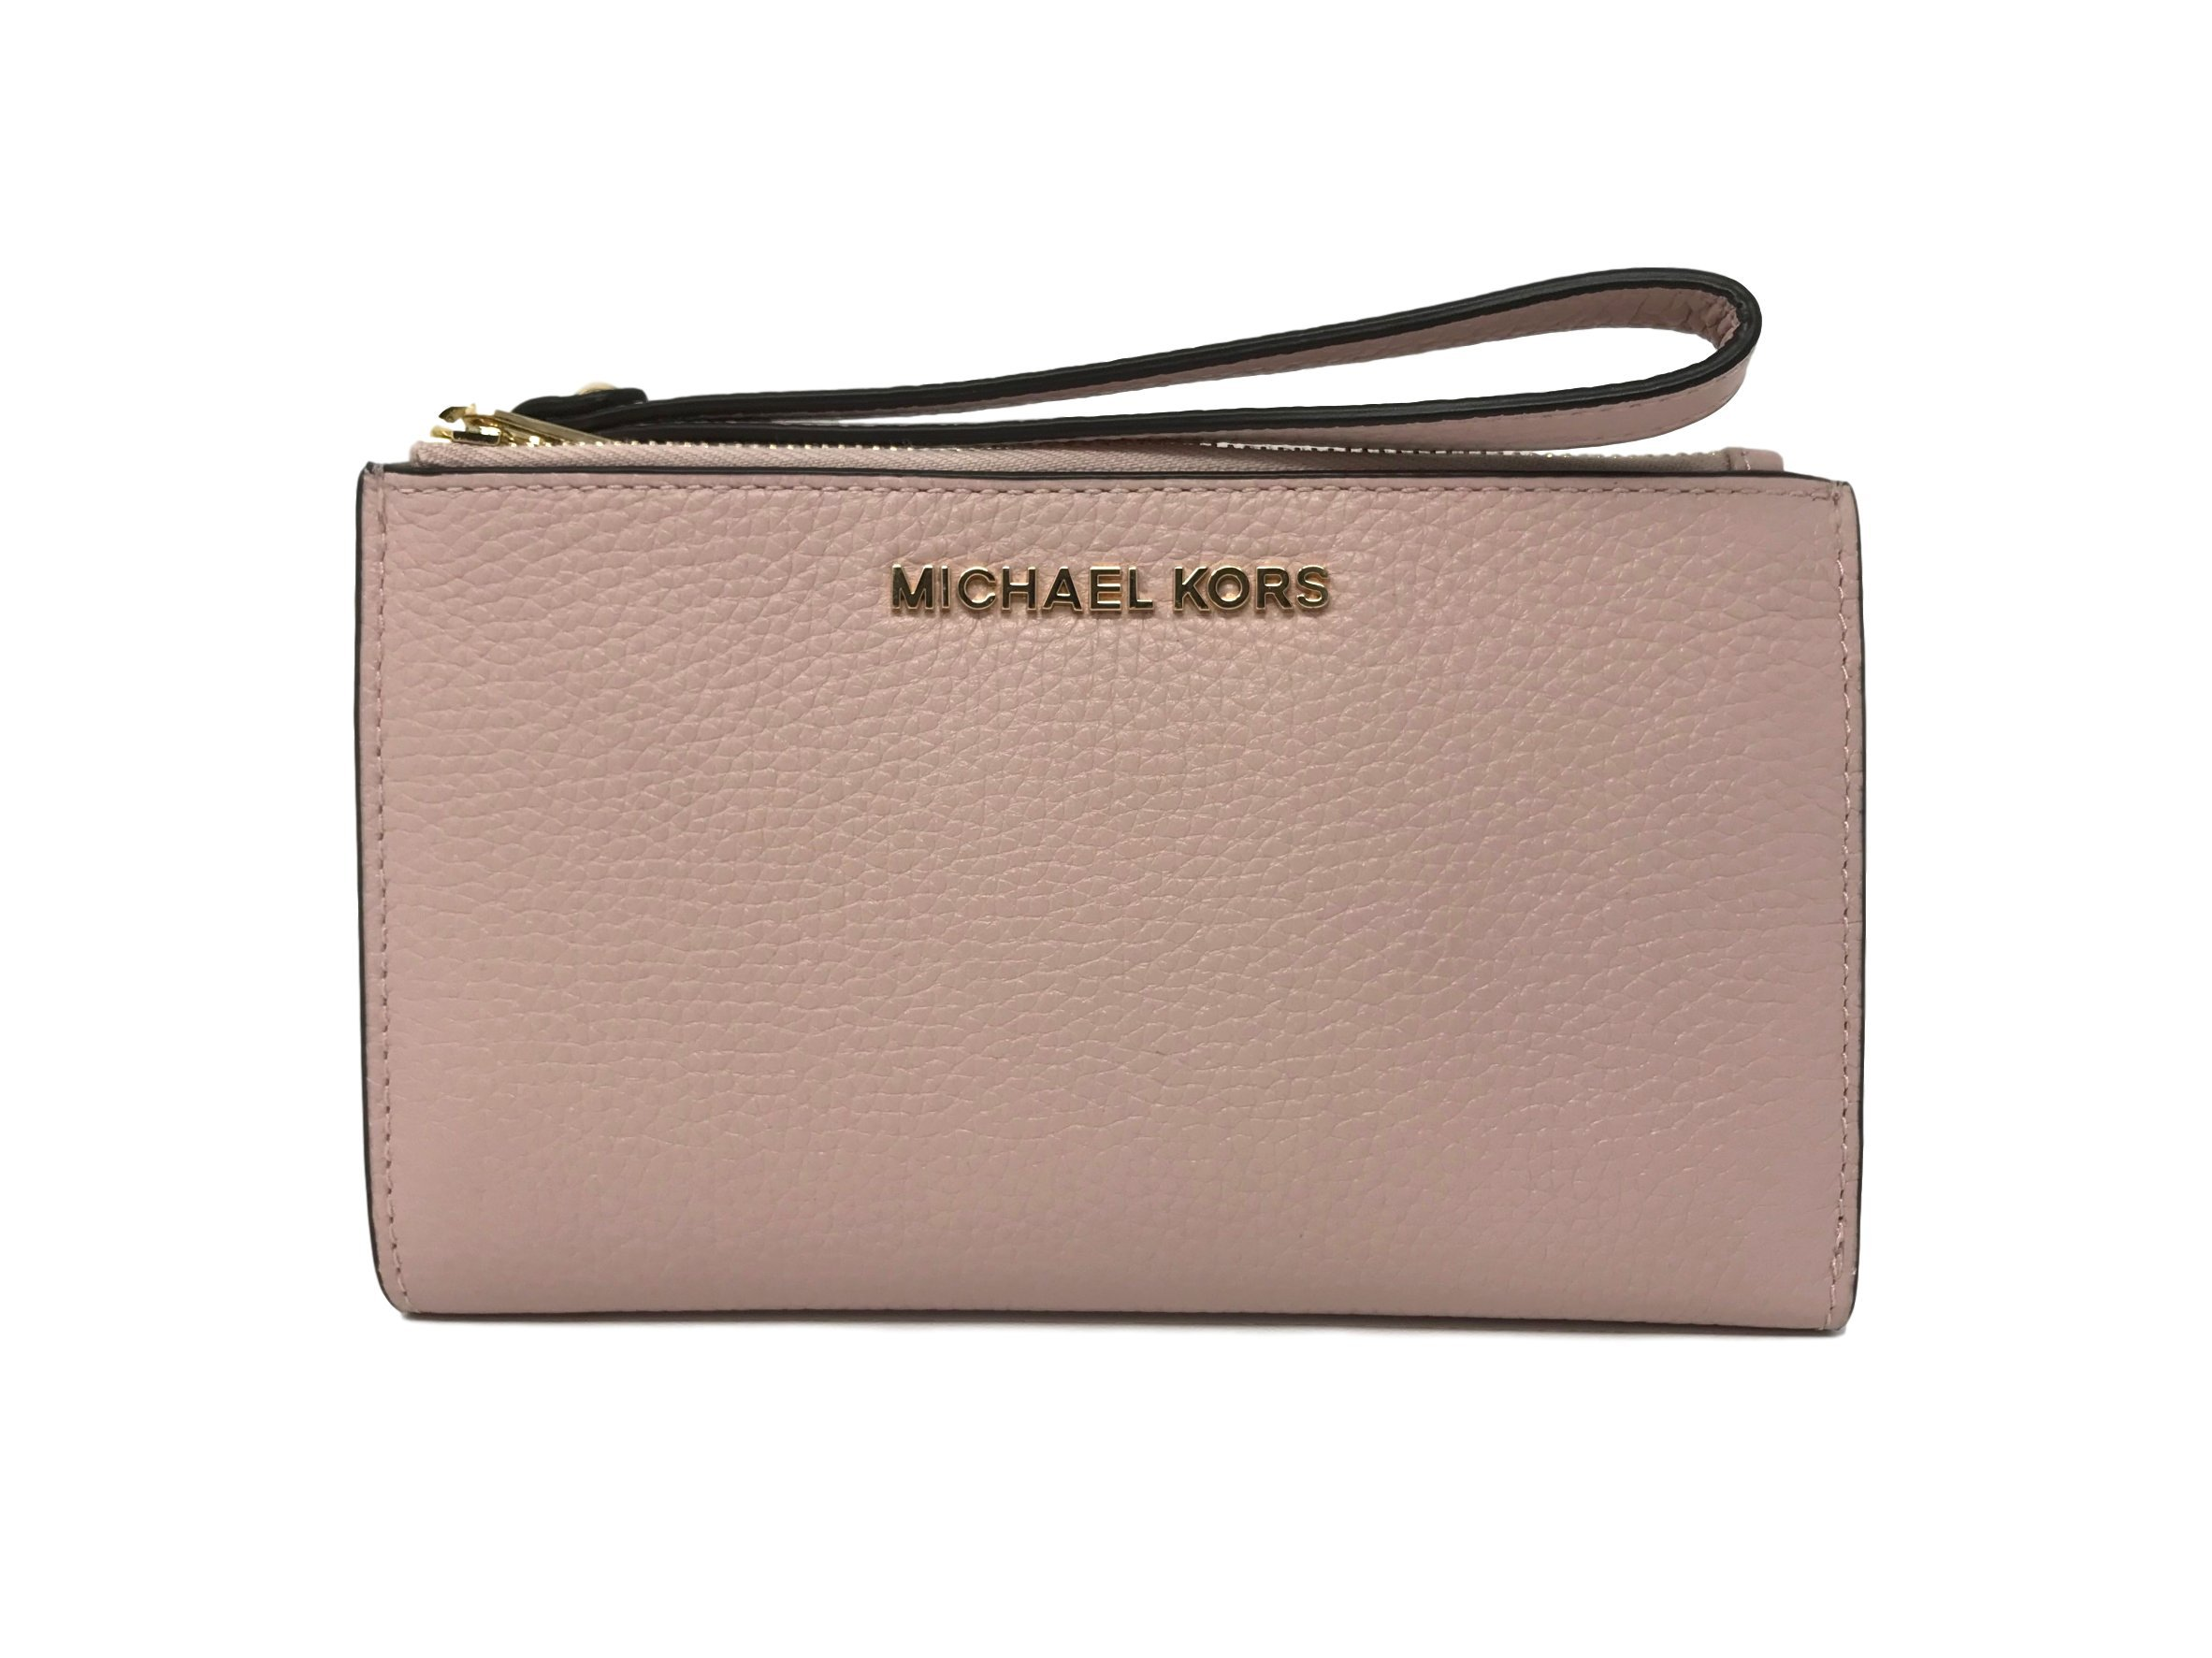 Michael Kors Jet Set Travel Double Zip Leather Wristlet Wallet in Blossom